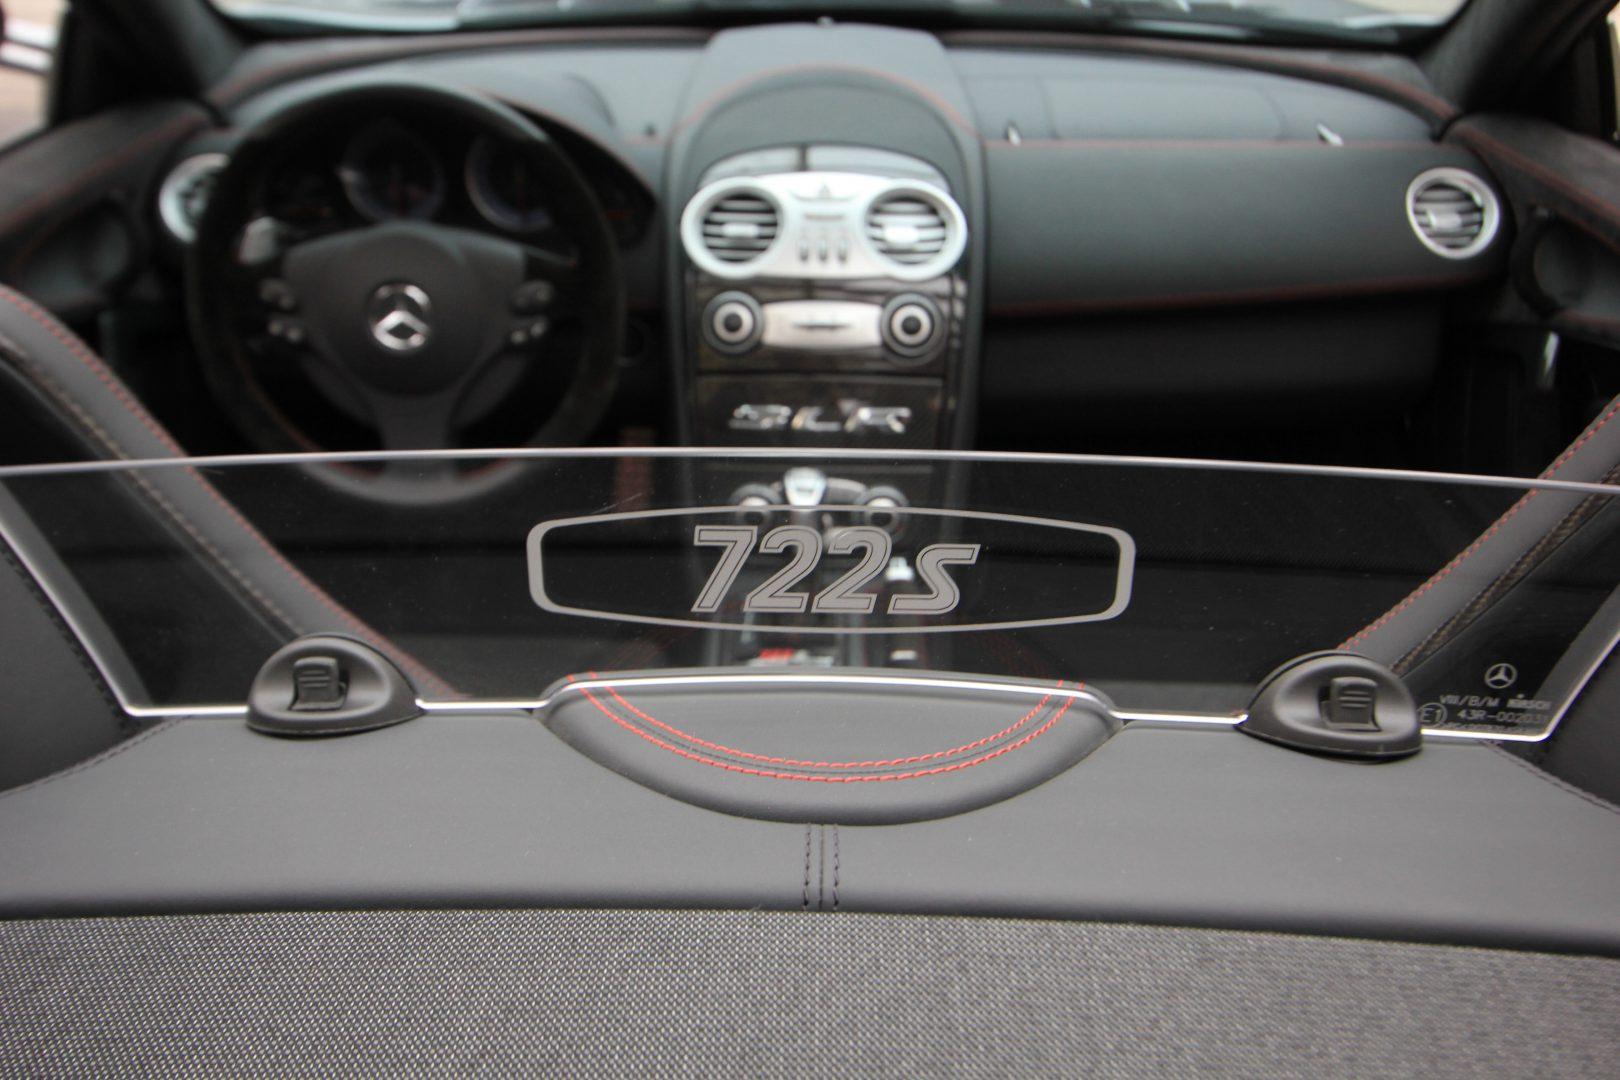 AIL Mercedes-Benz SLR McLaren Roadster 722 S 3